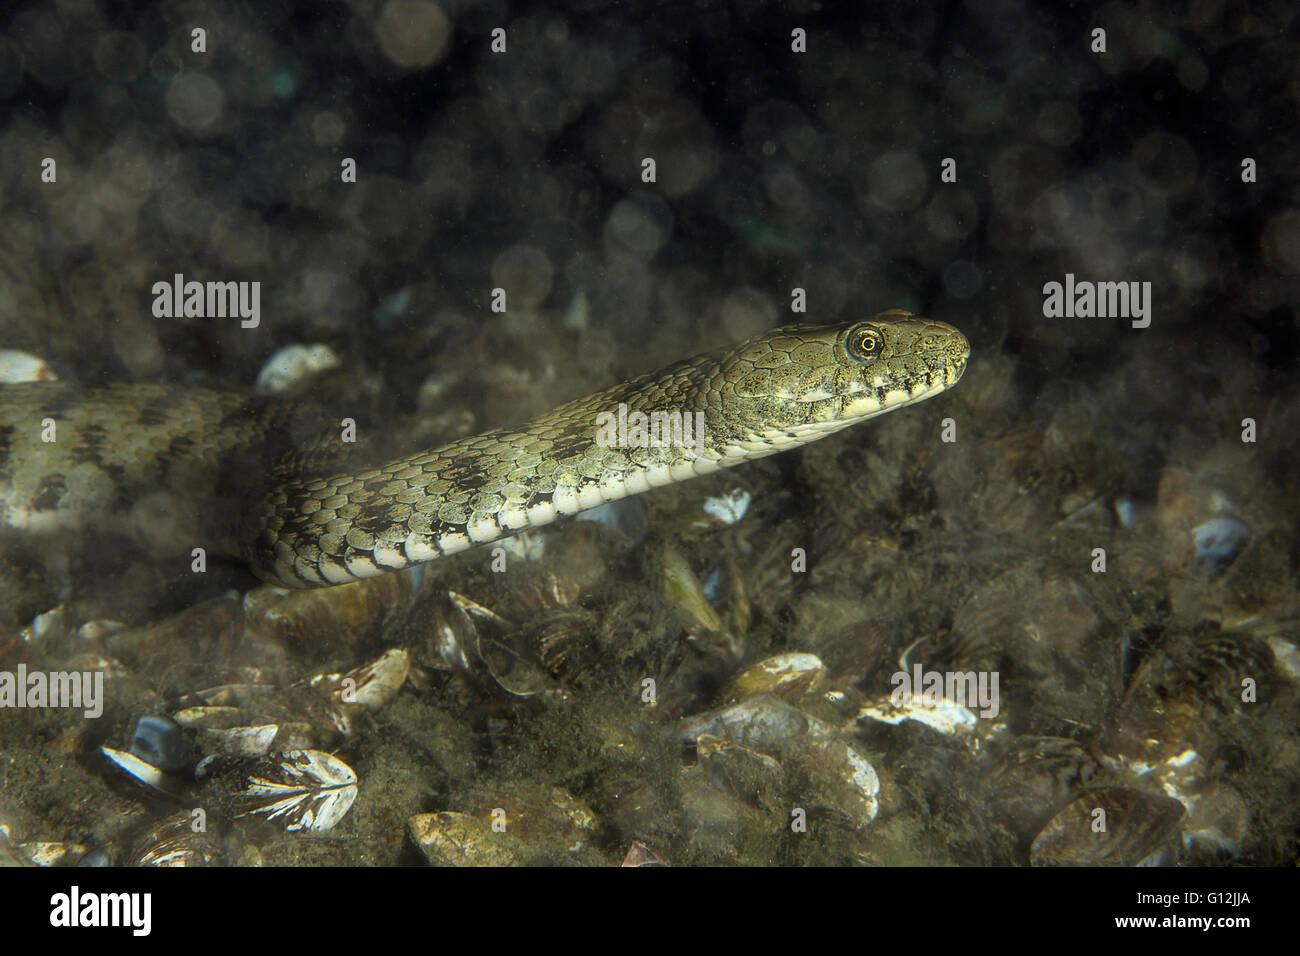 Dice Snake, Natrix tessellata, Lake Lugano, Switzerland - Stock Image